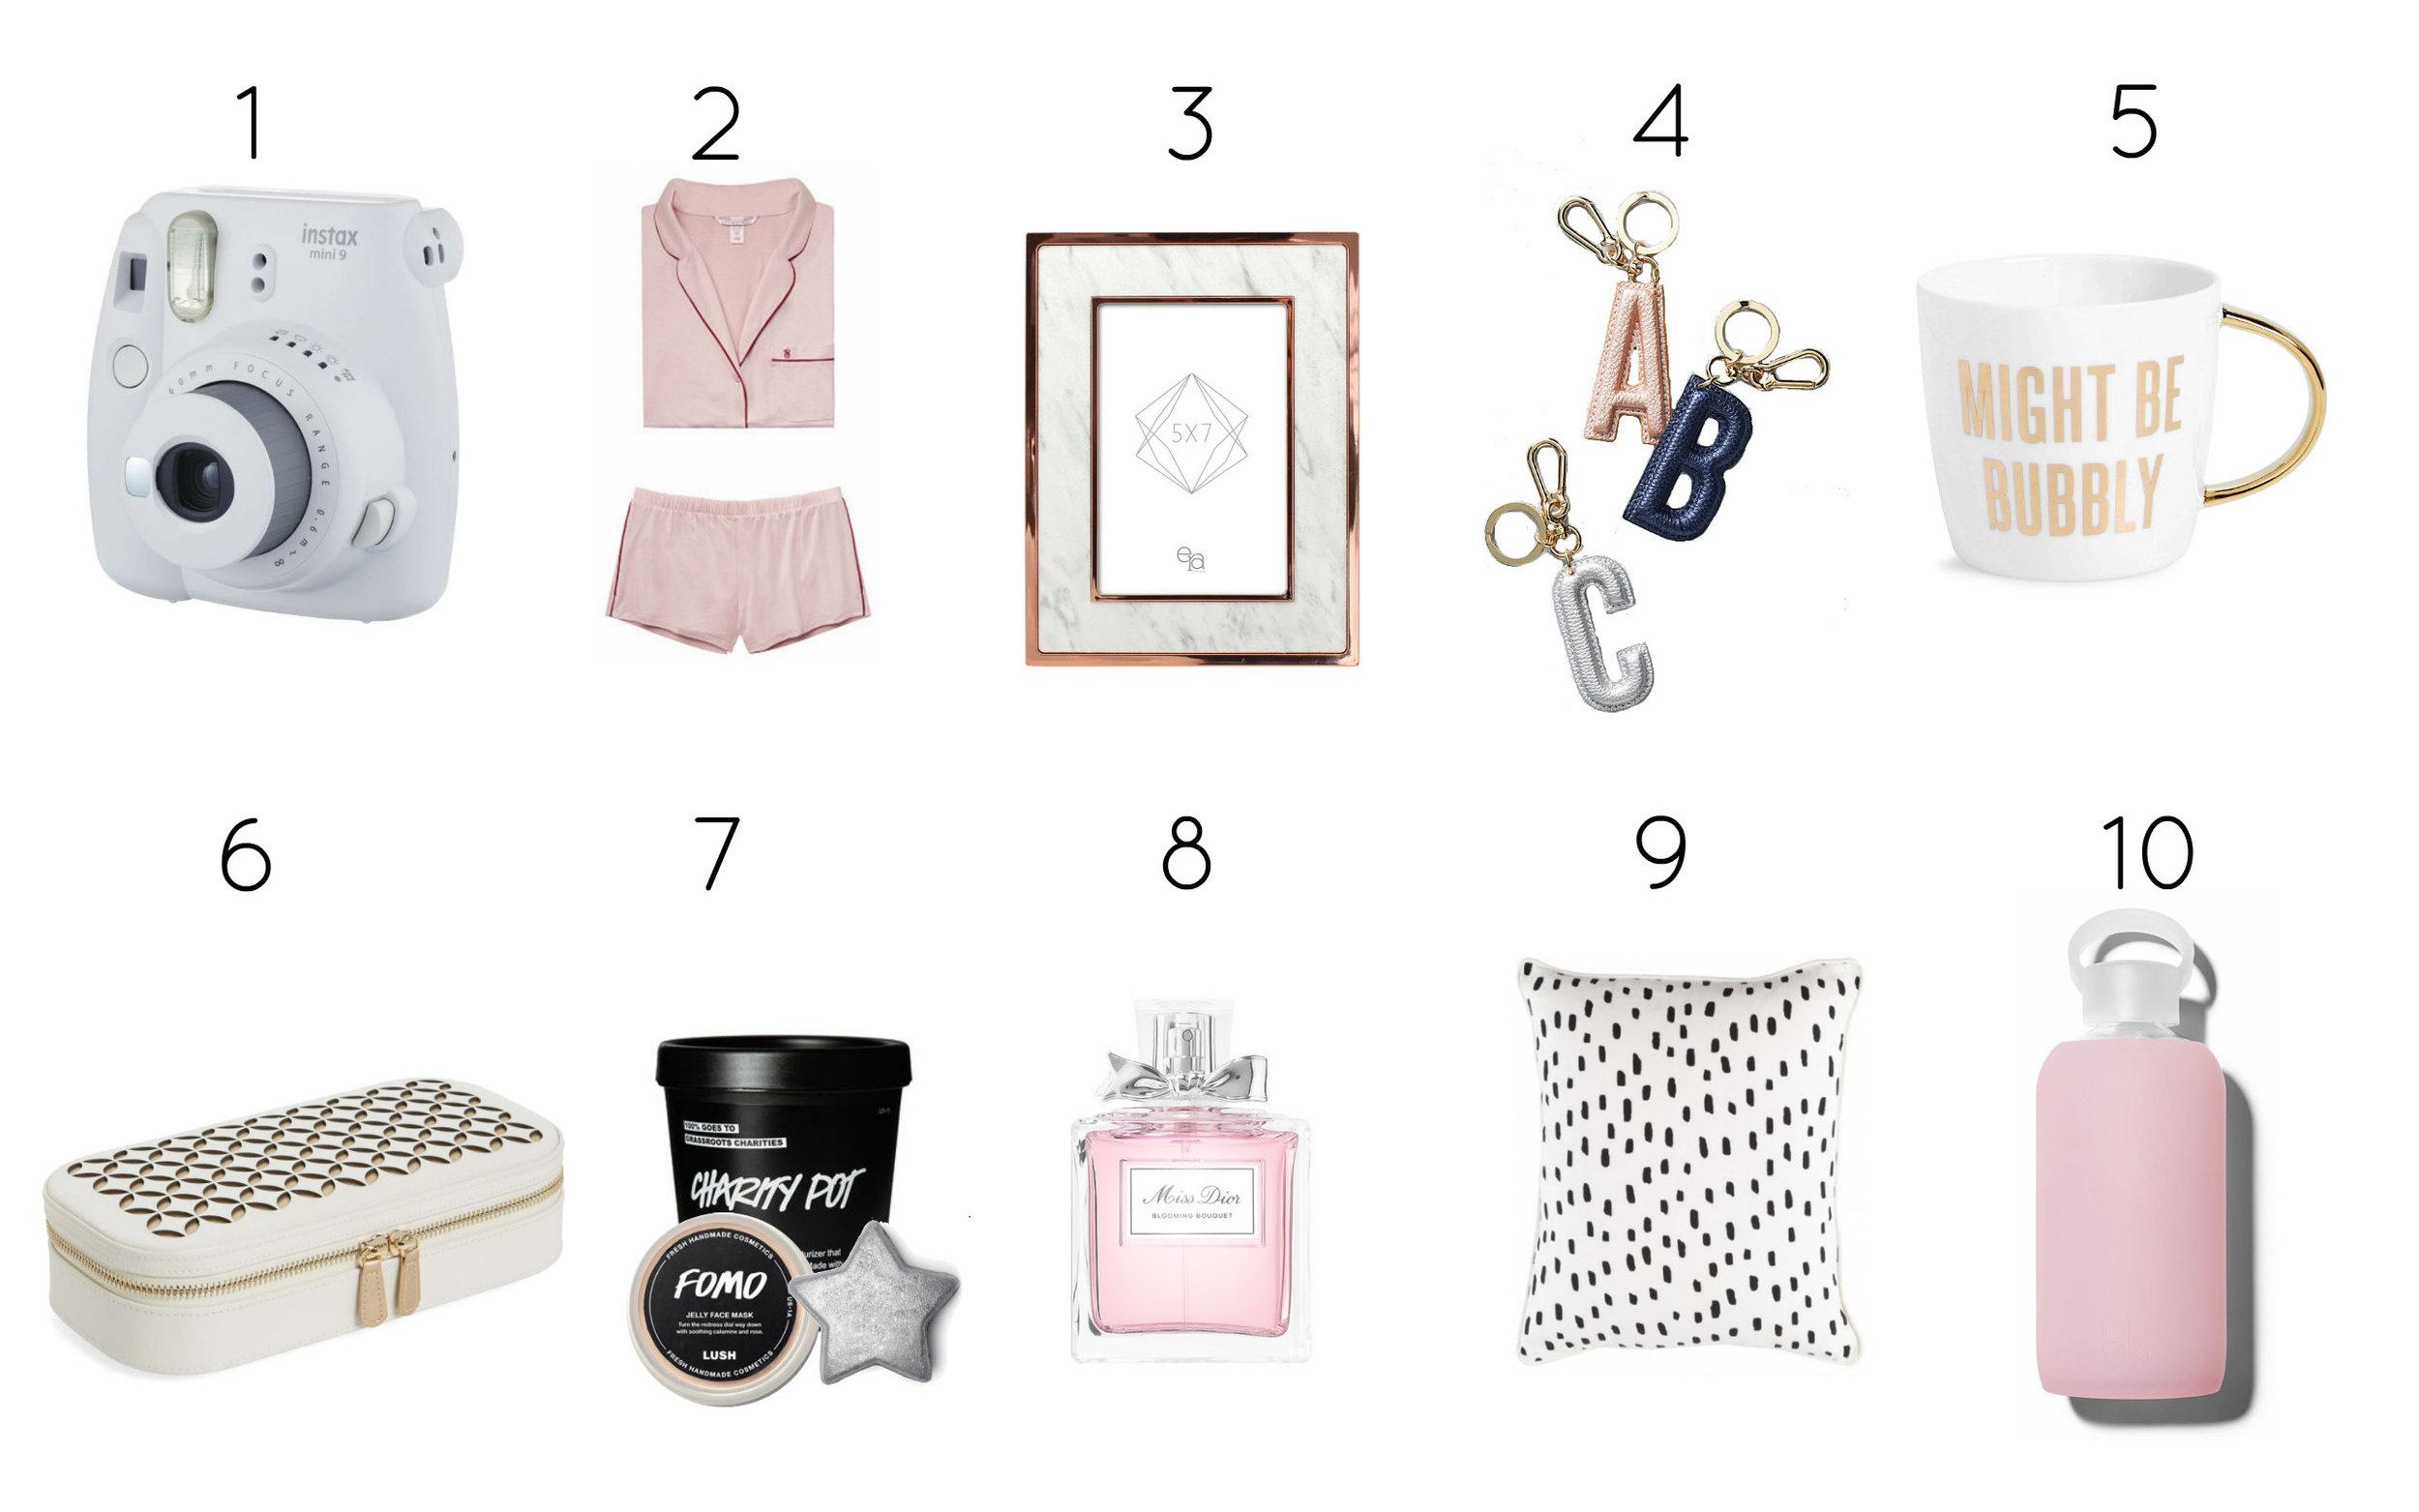 Holiday Gift Guide - The Basic B.jpg